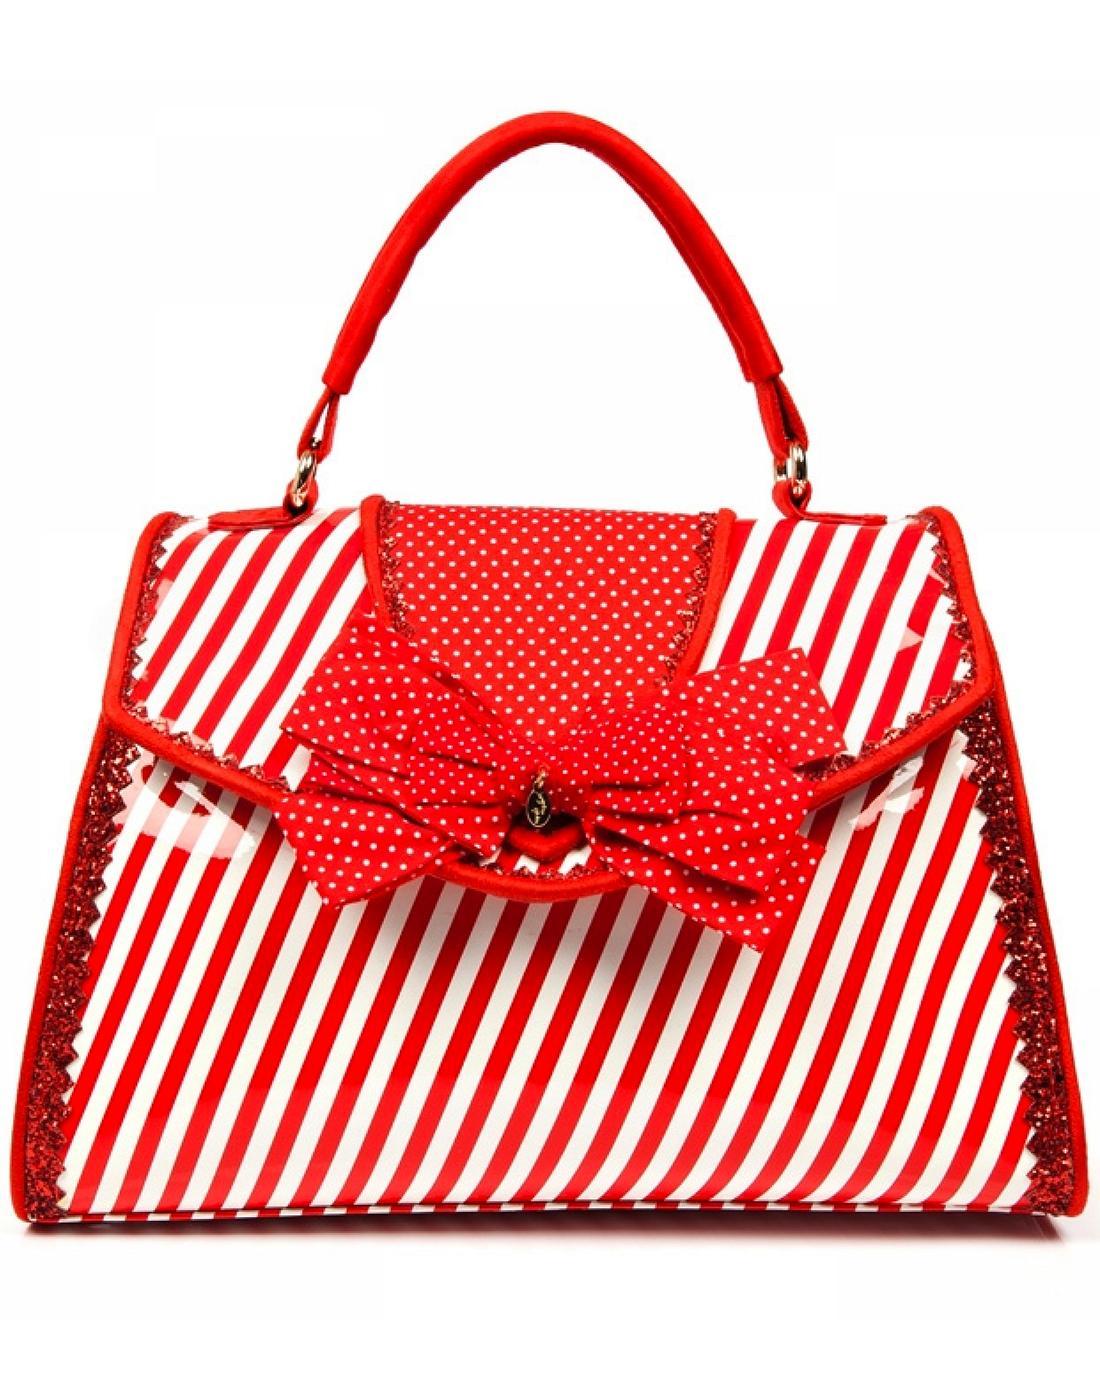 Peggy IRREGULAR CHOICE Retro Box Hangbag in Red